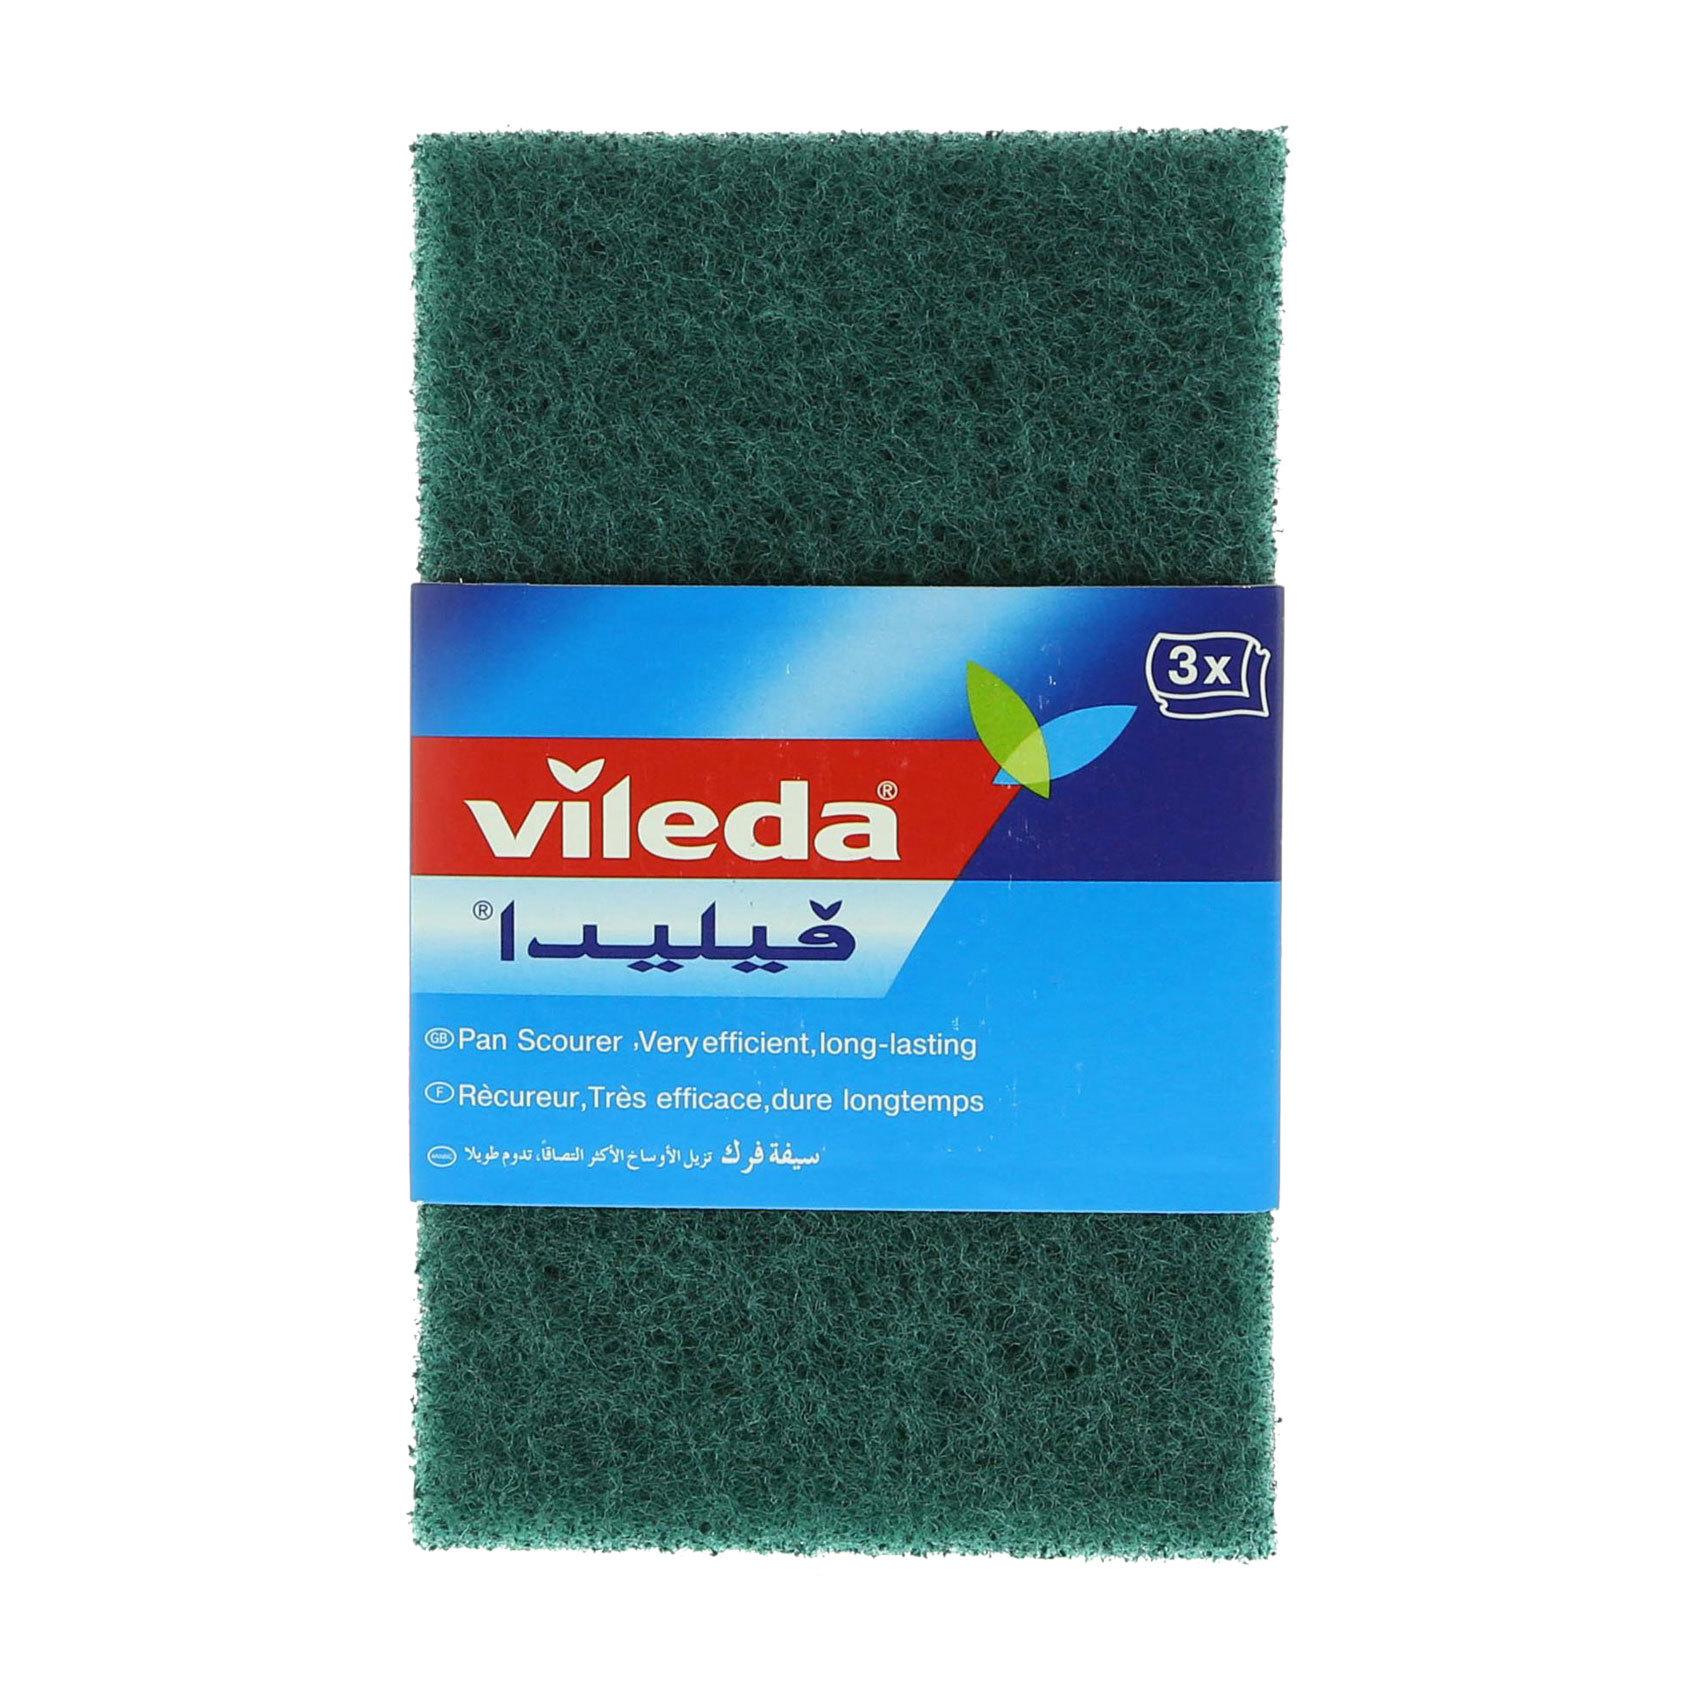 VILEDA SCOURING PAD X 3 PAN